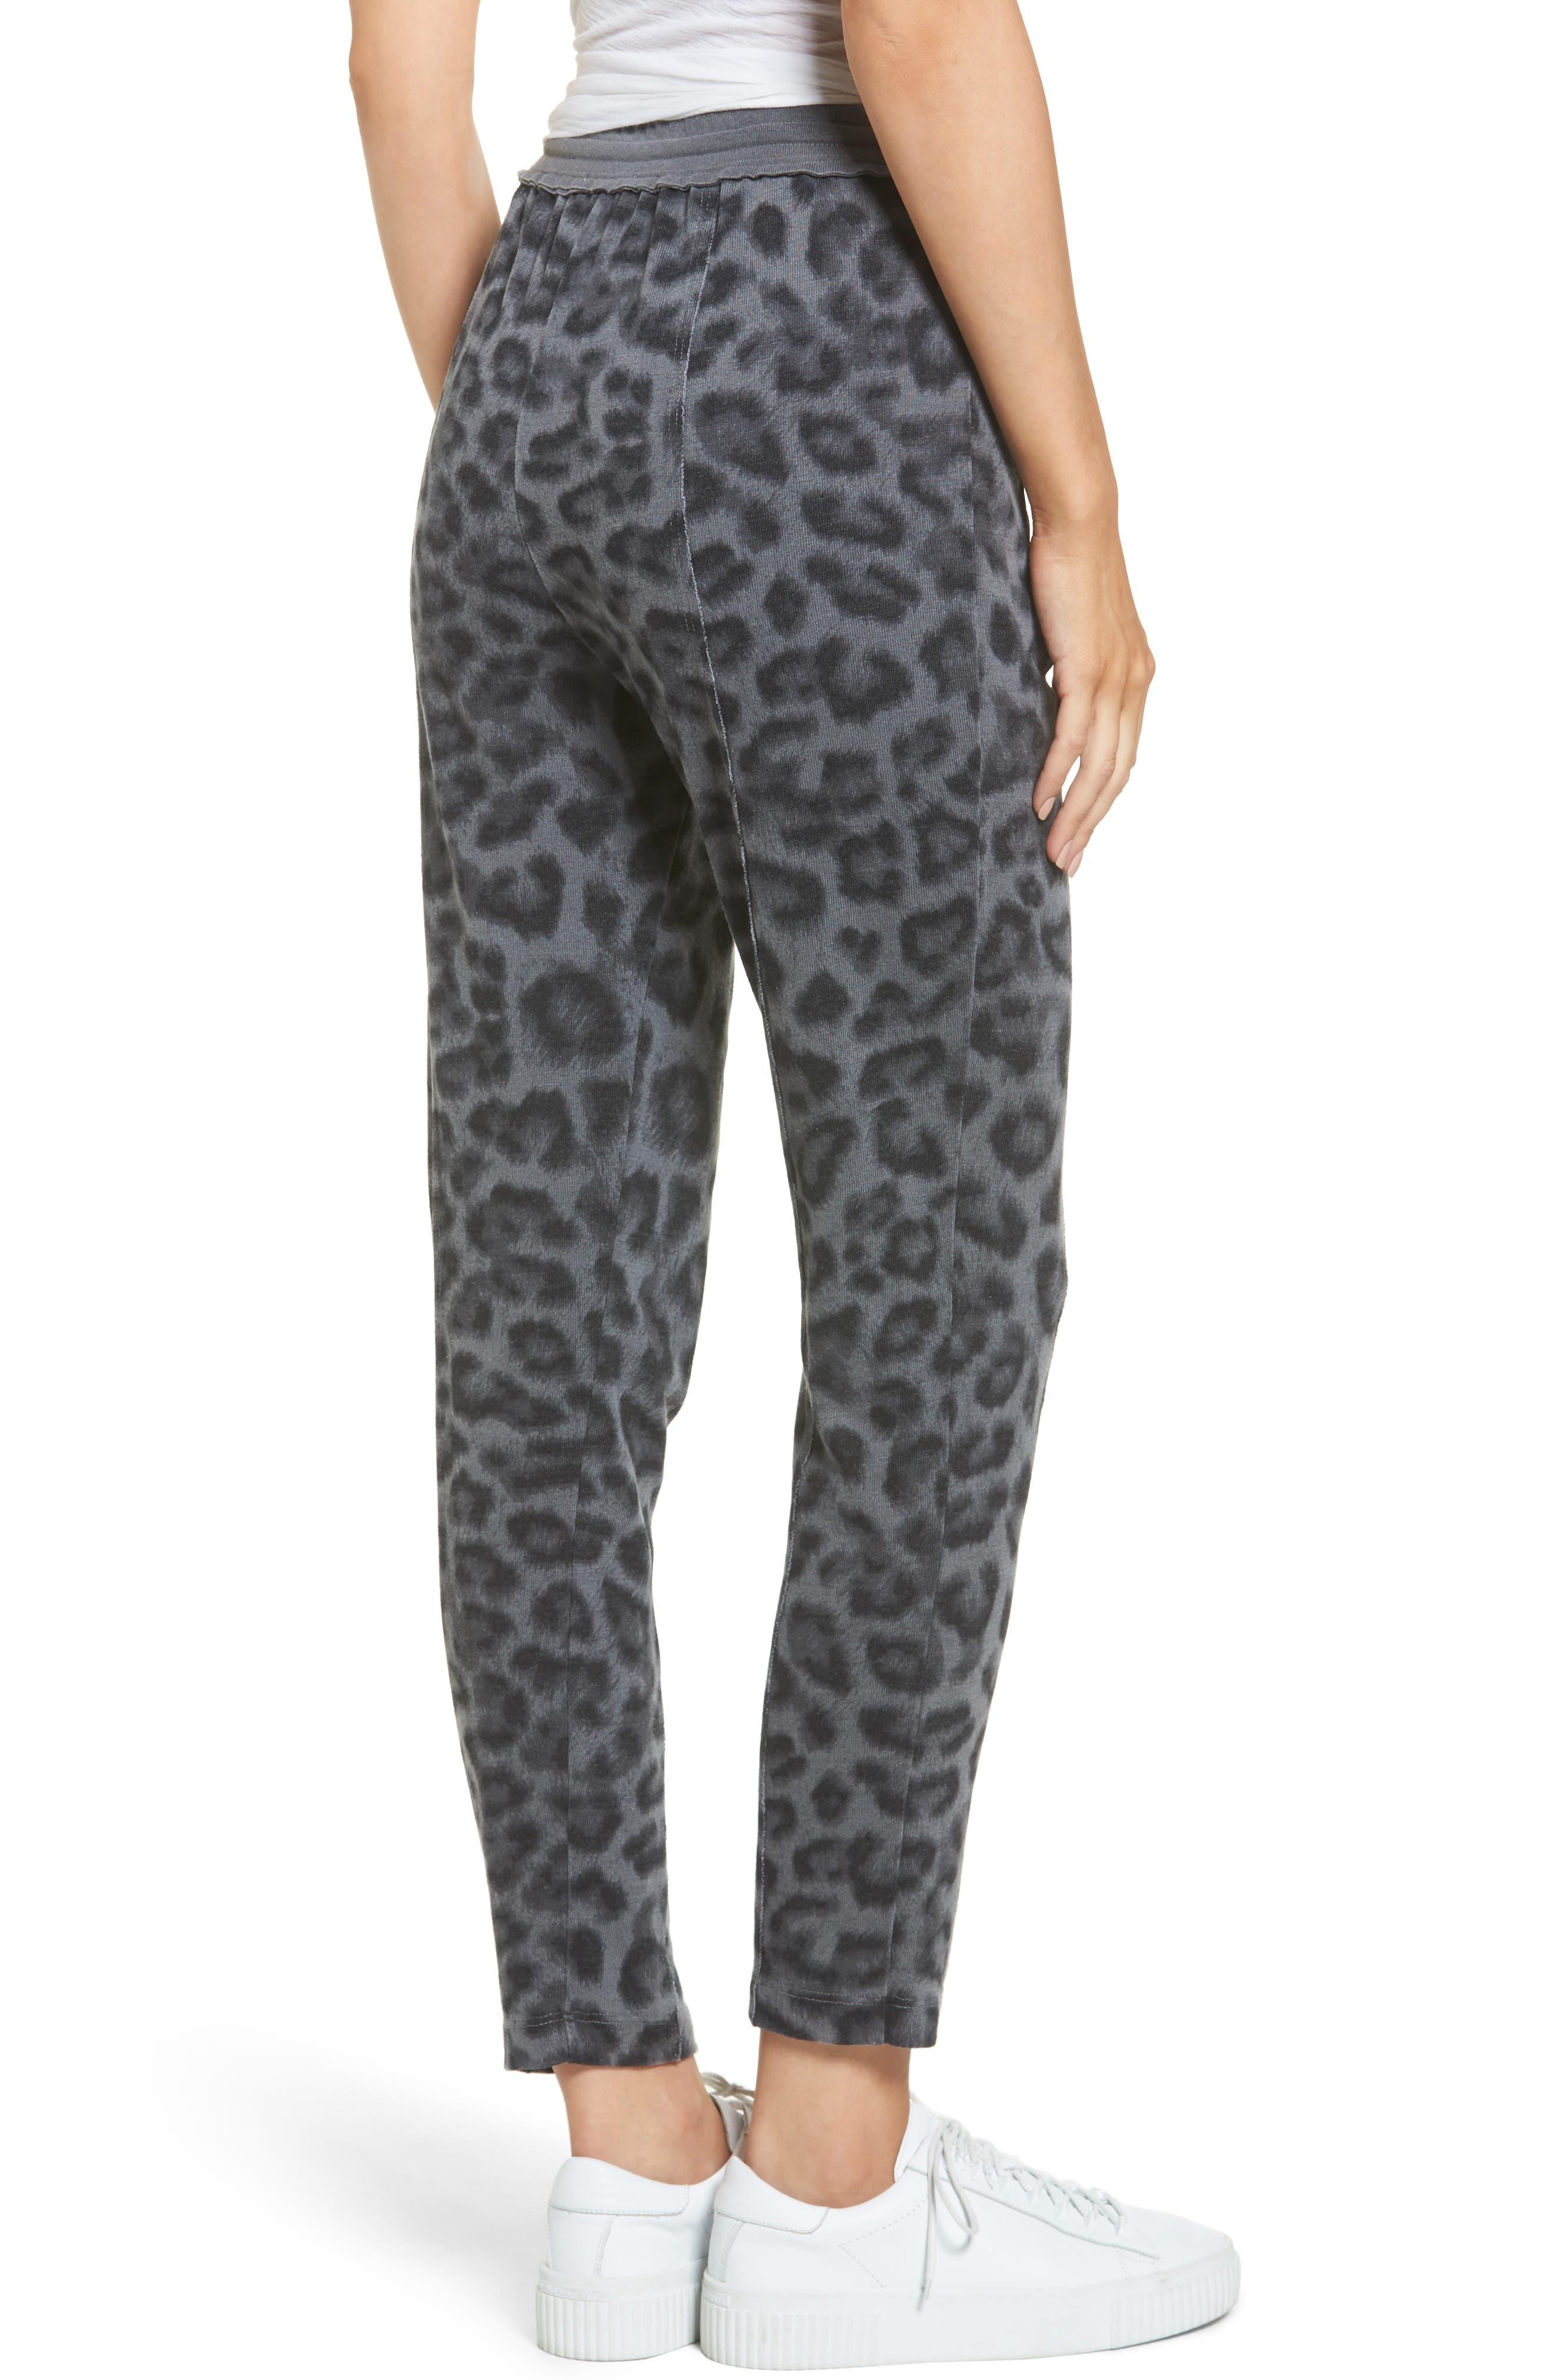 Leopard Print Jogger Pants,                             Alternate thumbnail 2, color,                             Lead